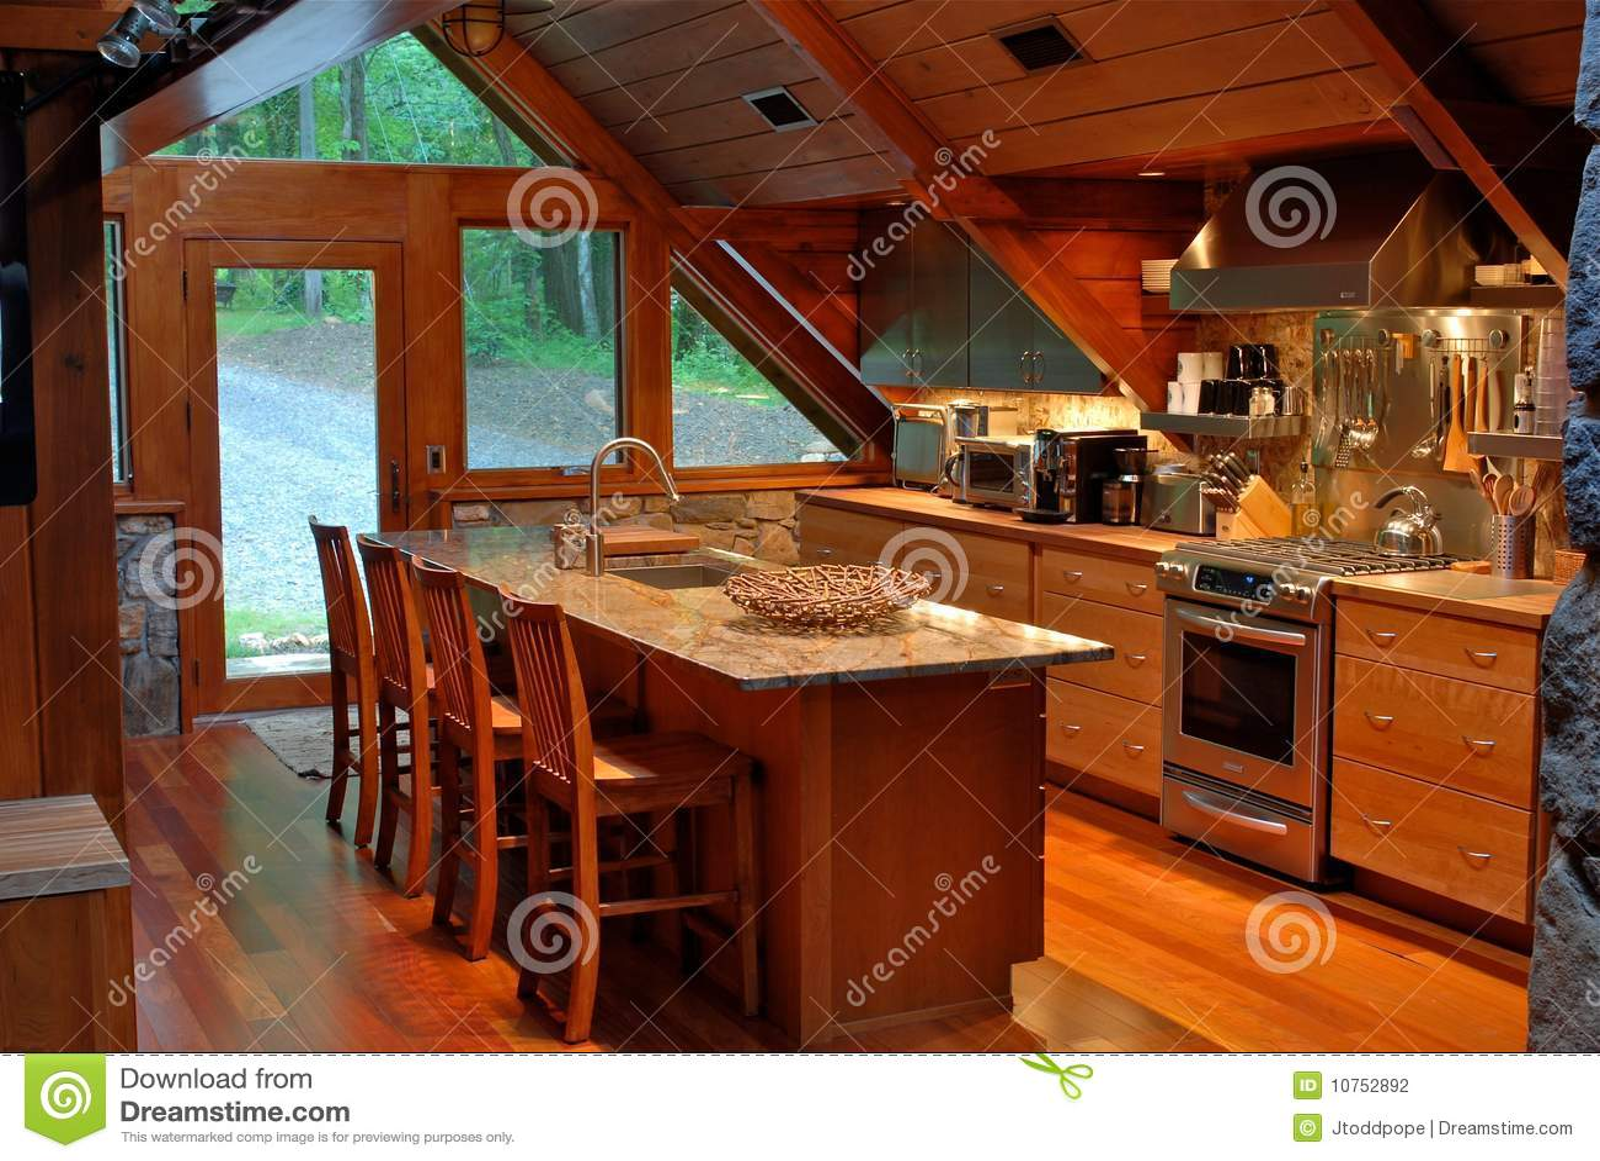 Cabin Kitchen Mountain Cabin Kitchen Stock Photography Image 10752892